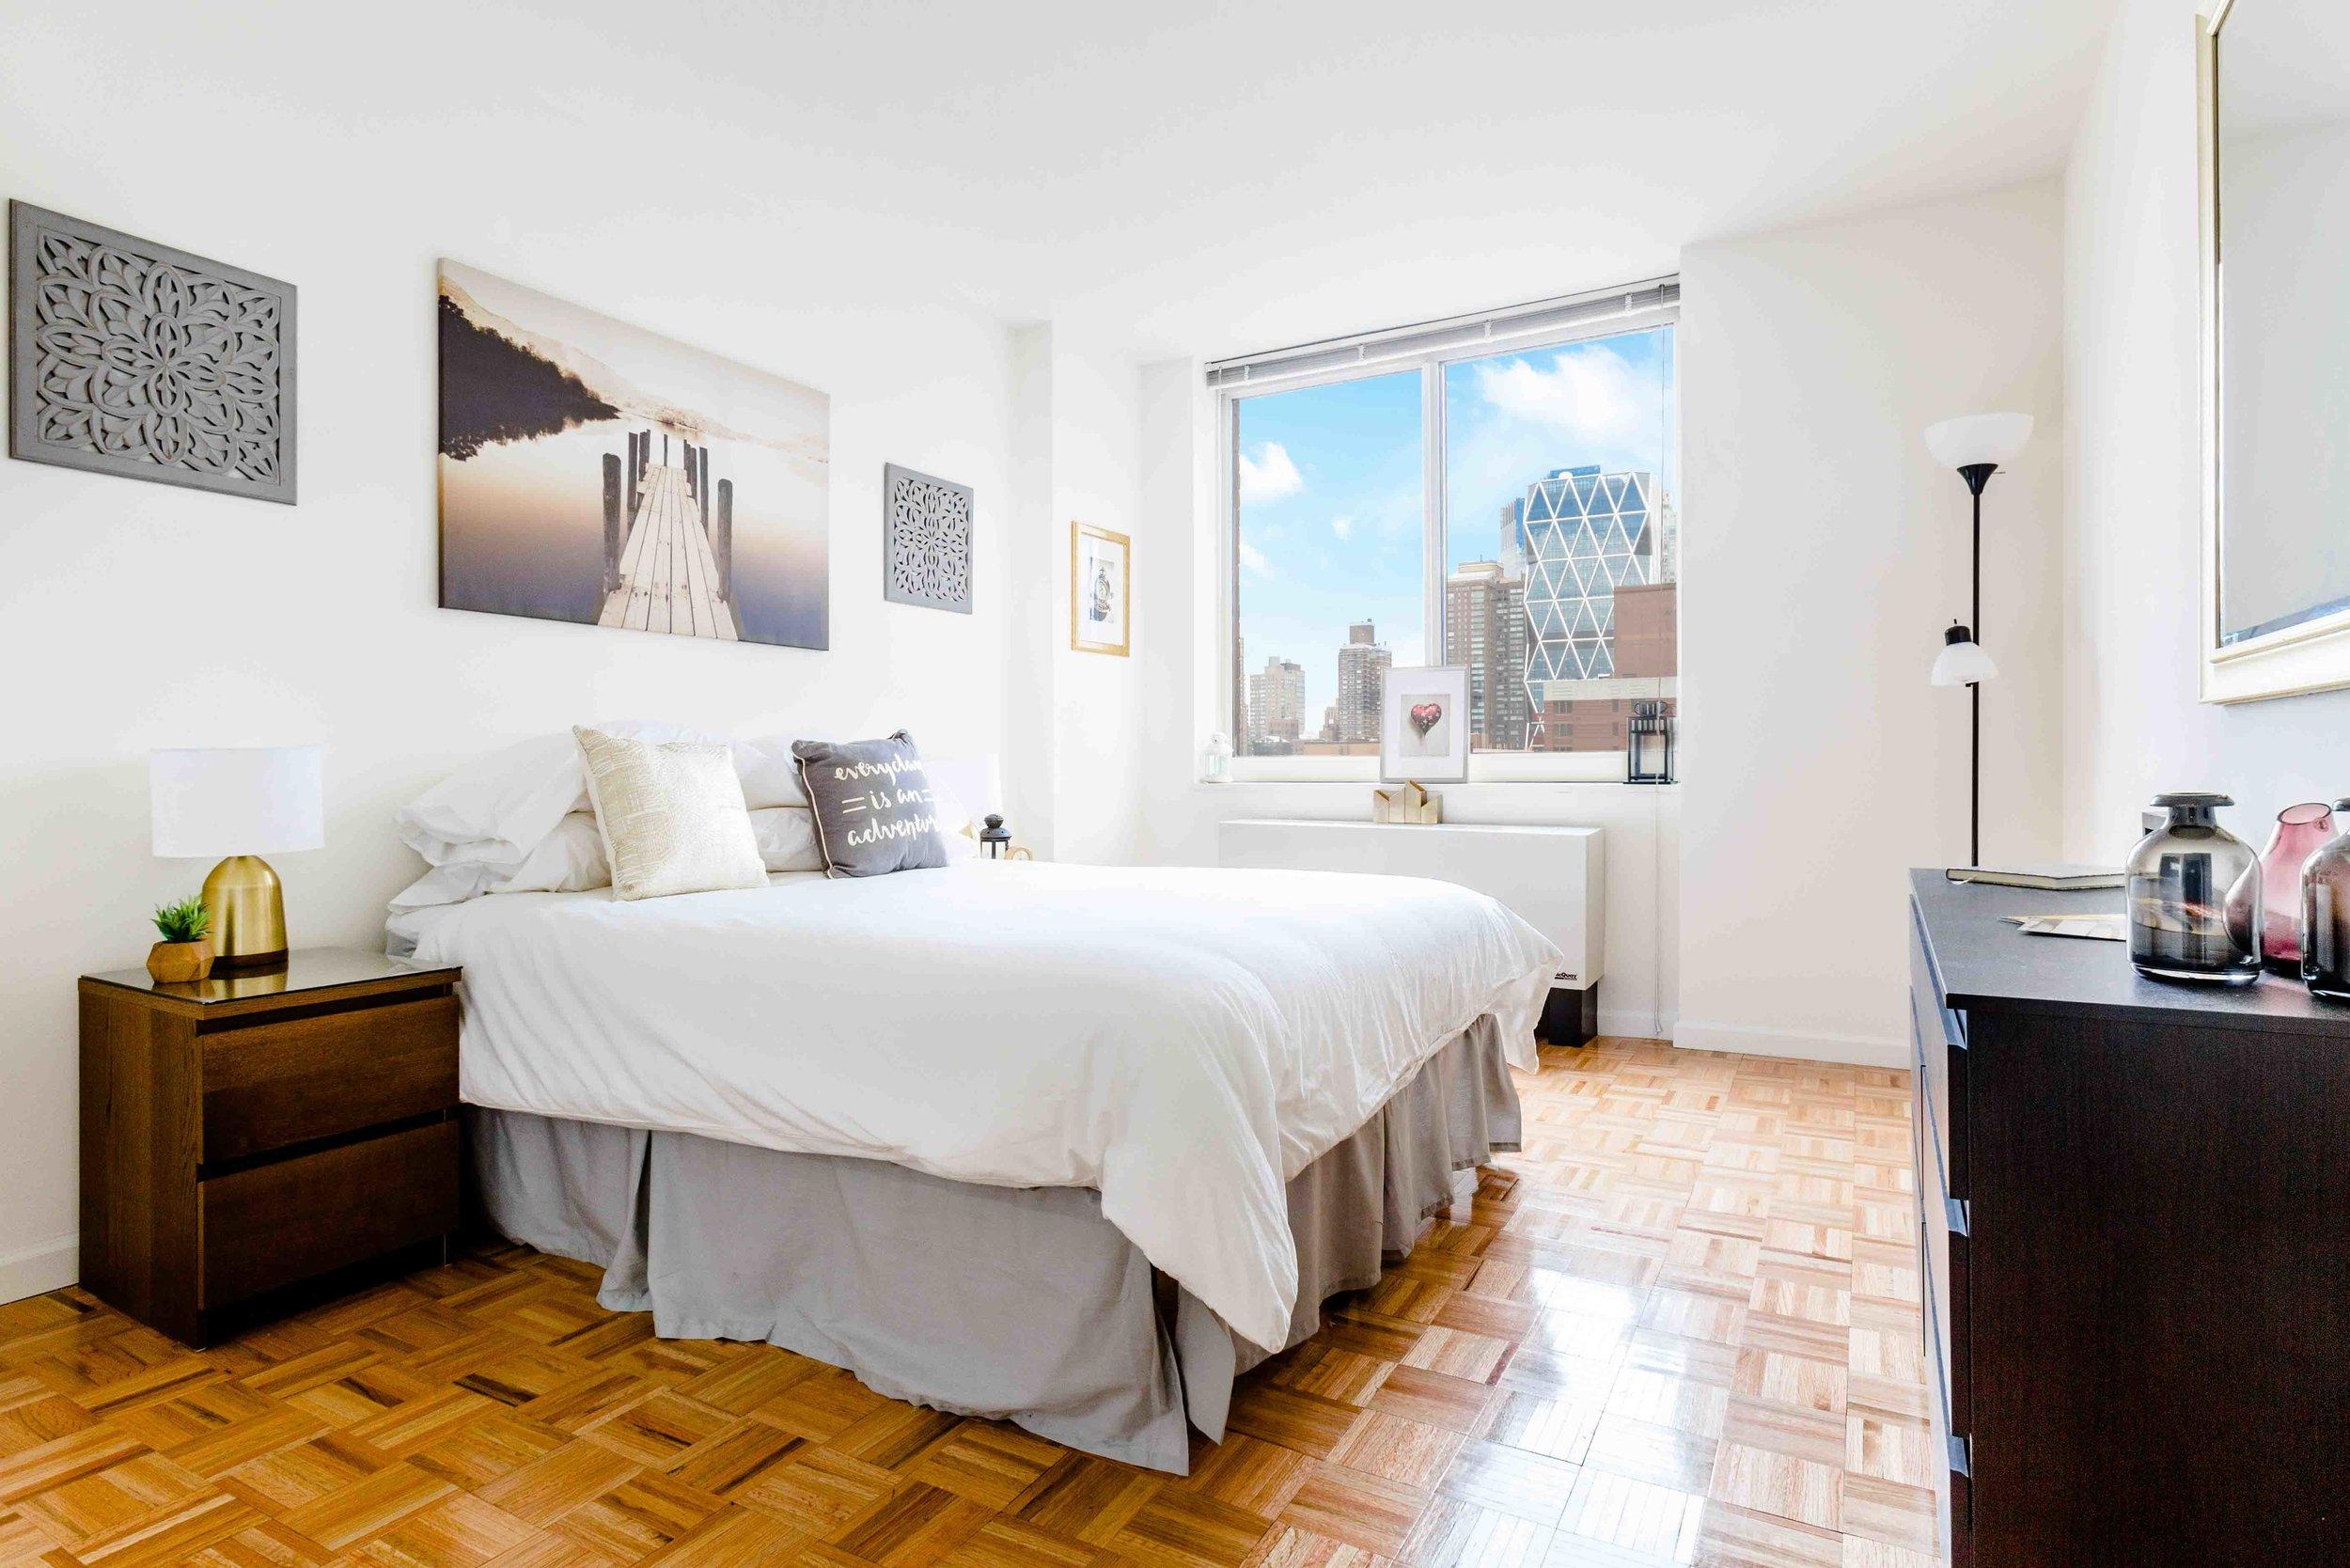 london-property-photos-photography-brixton-bedroom-1.jpg